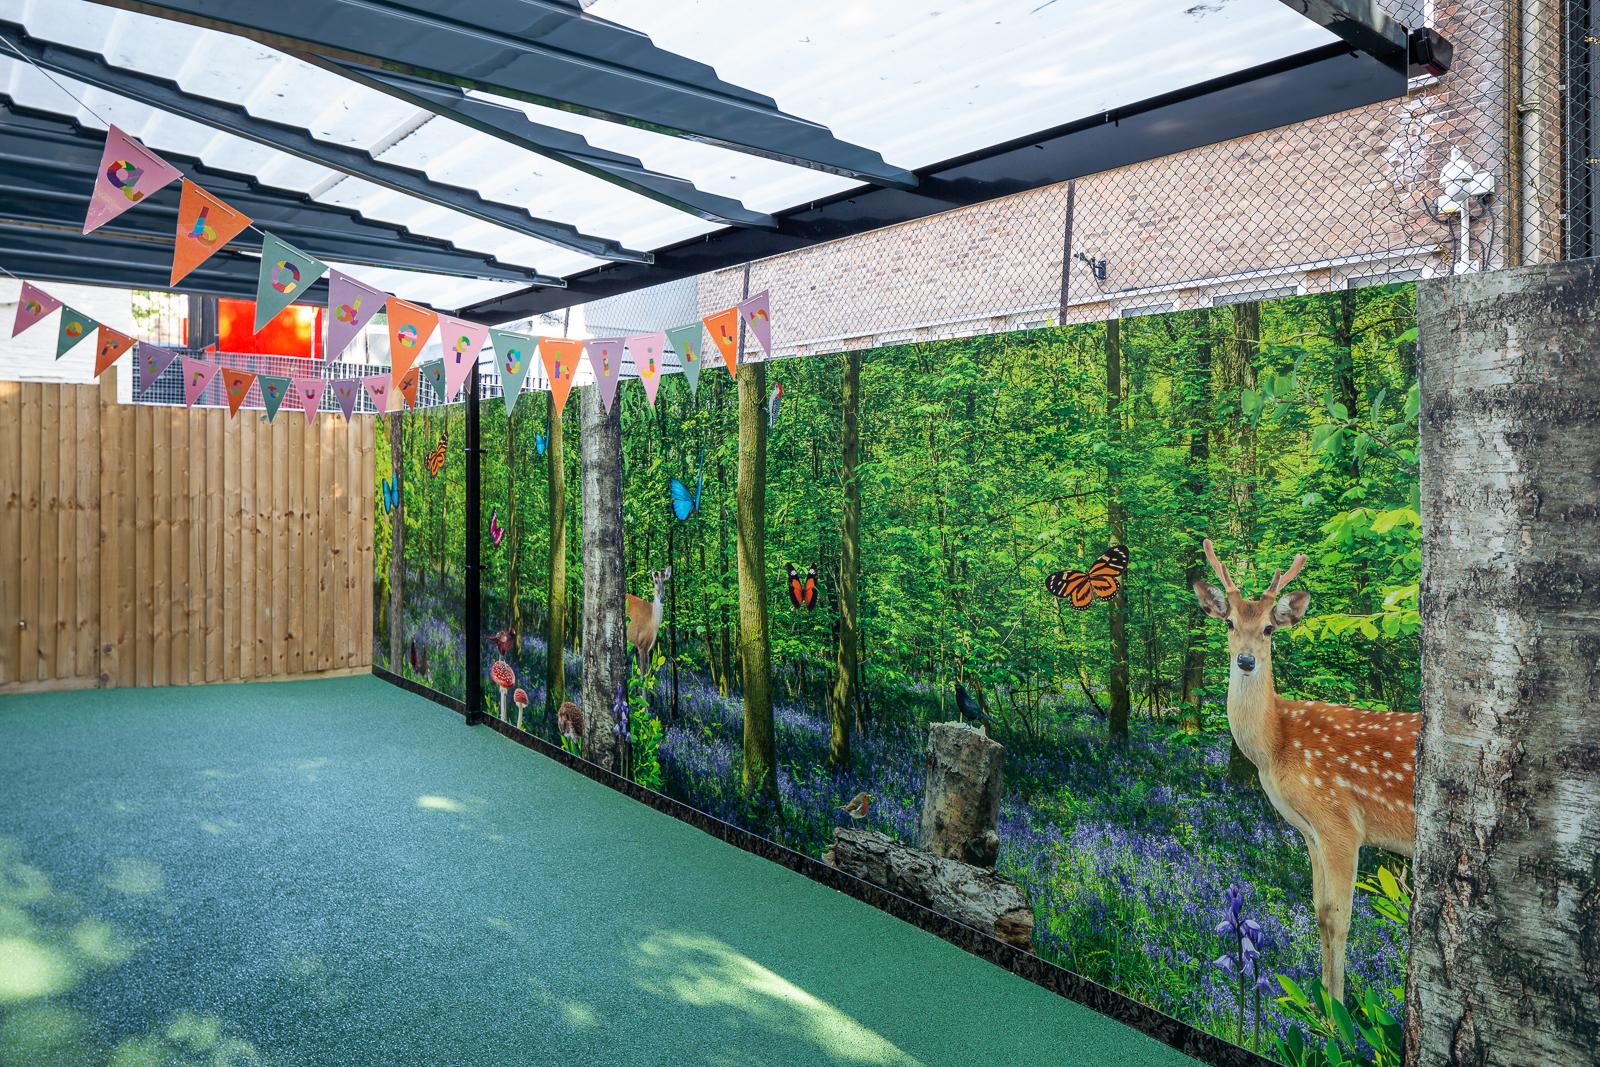 Outdoor wall art installation image